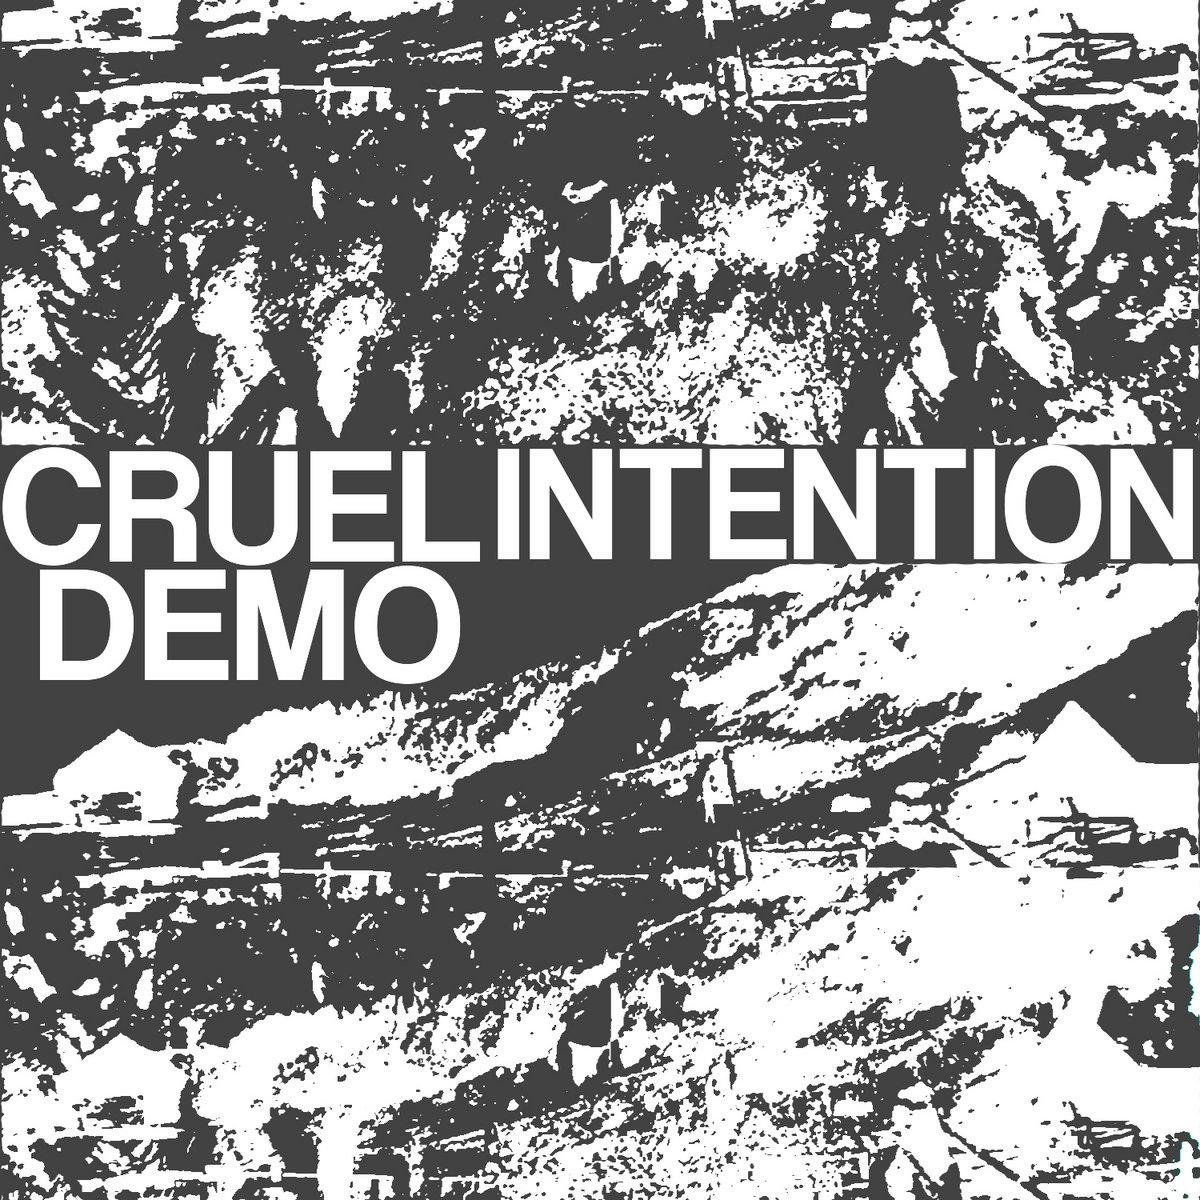 Cruel Intention-Part 2